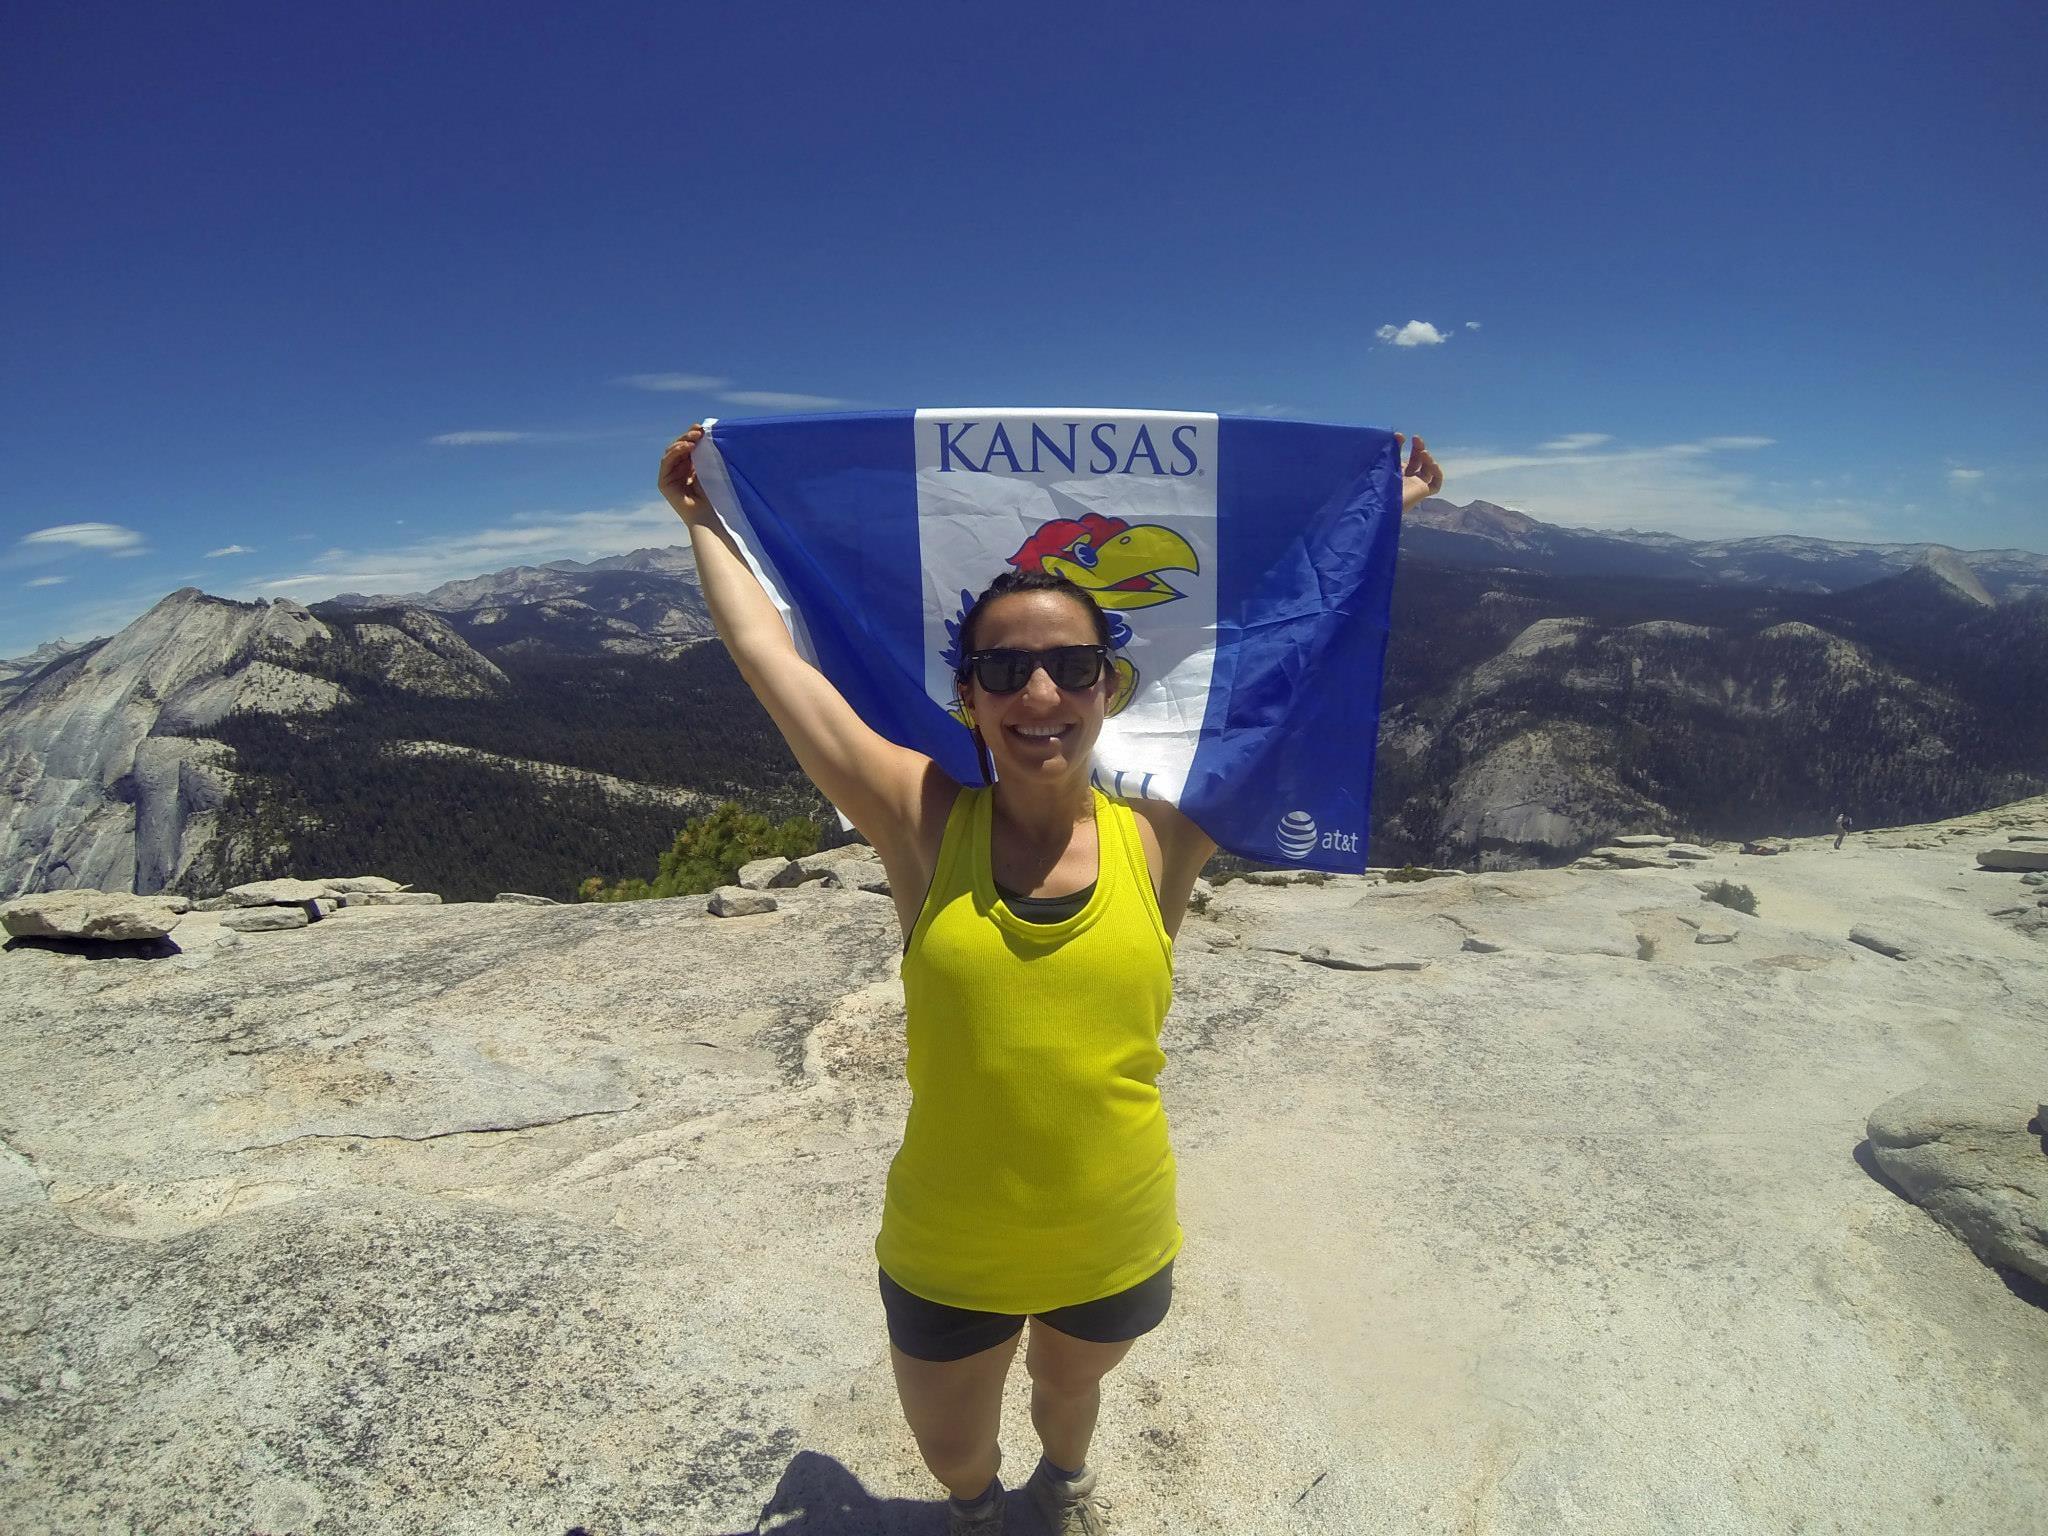 Blair showing Kansas Pride at the top of Half Dome, Yosemite.      Photo Credit: Erik Anderson